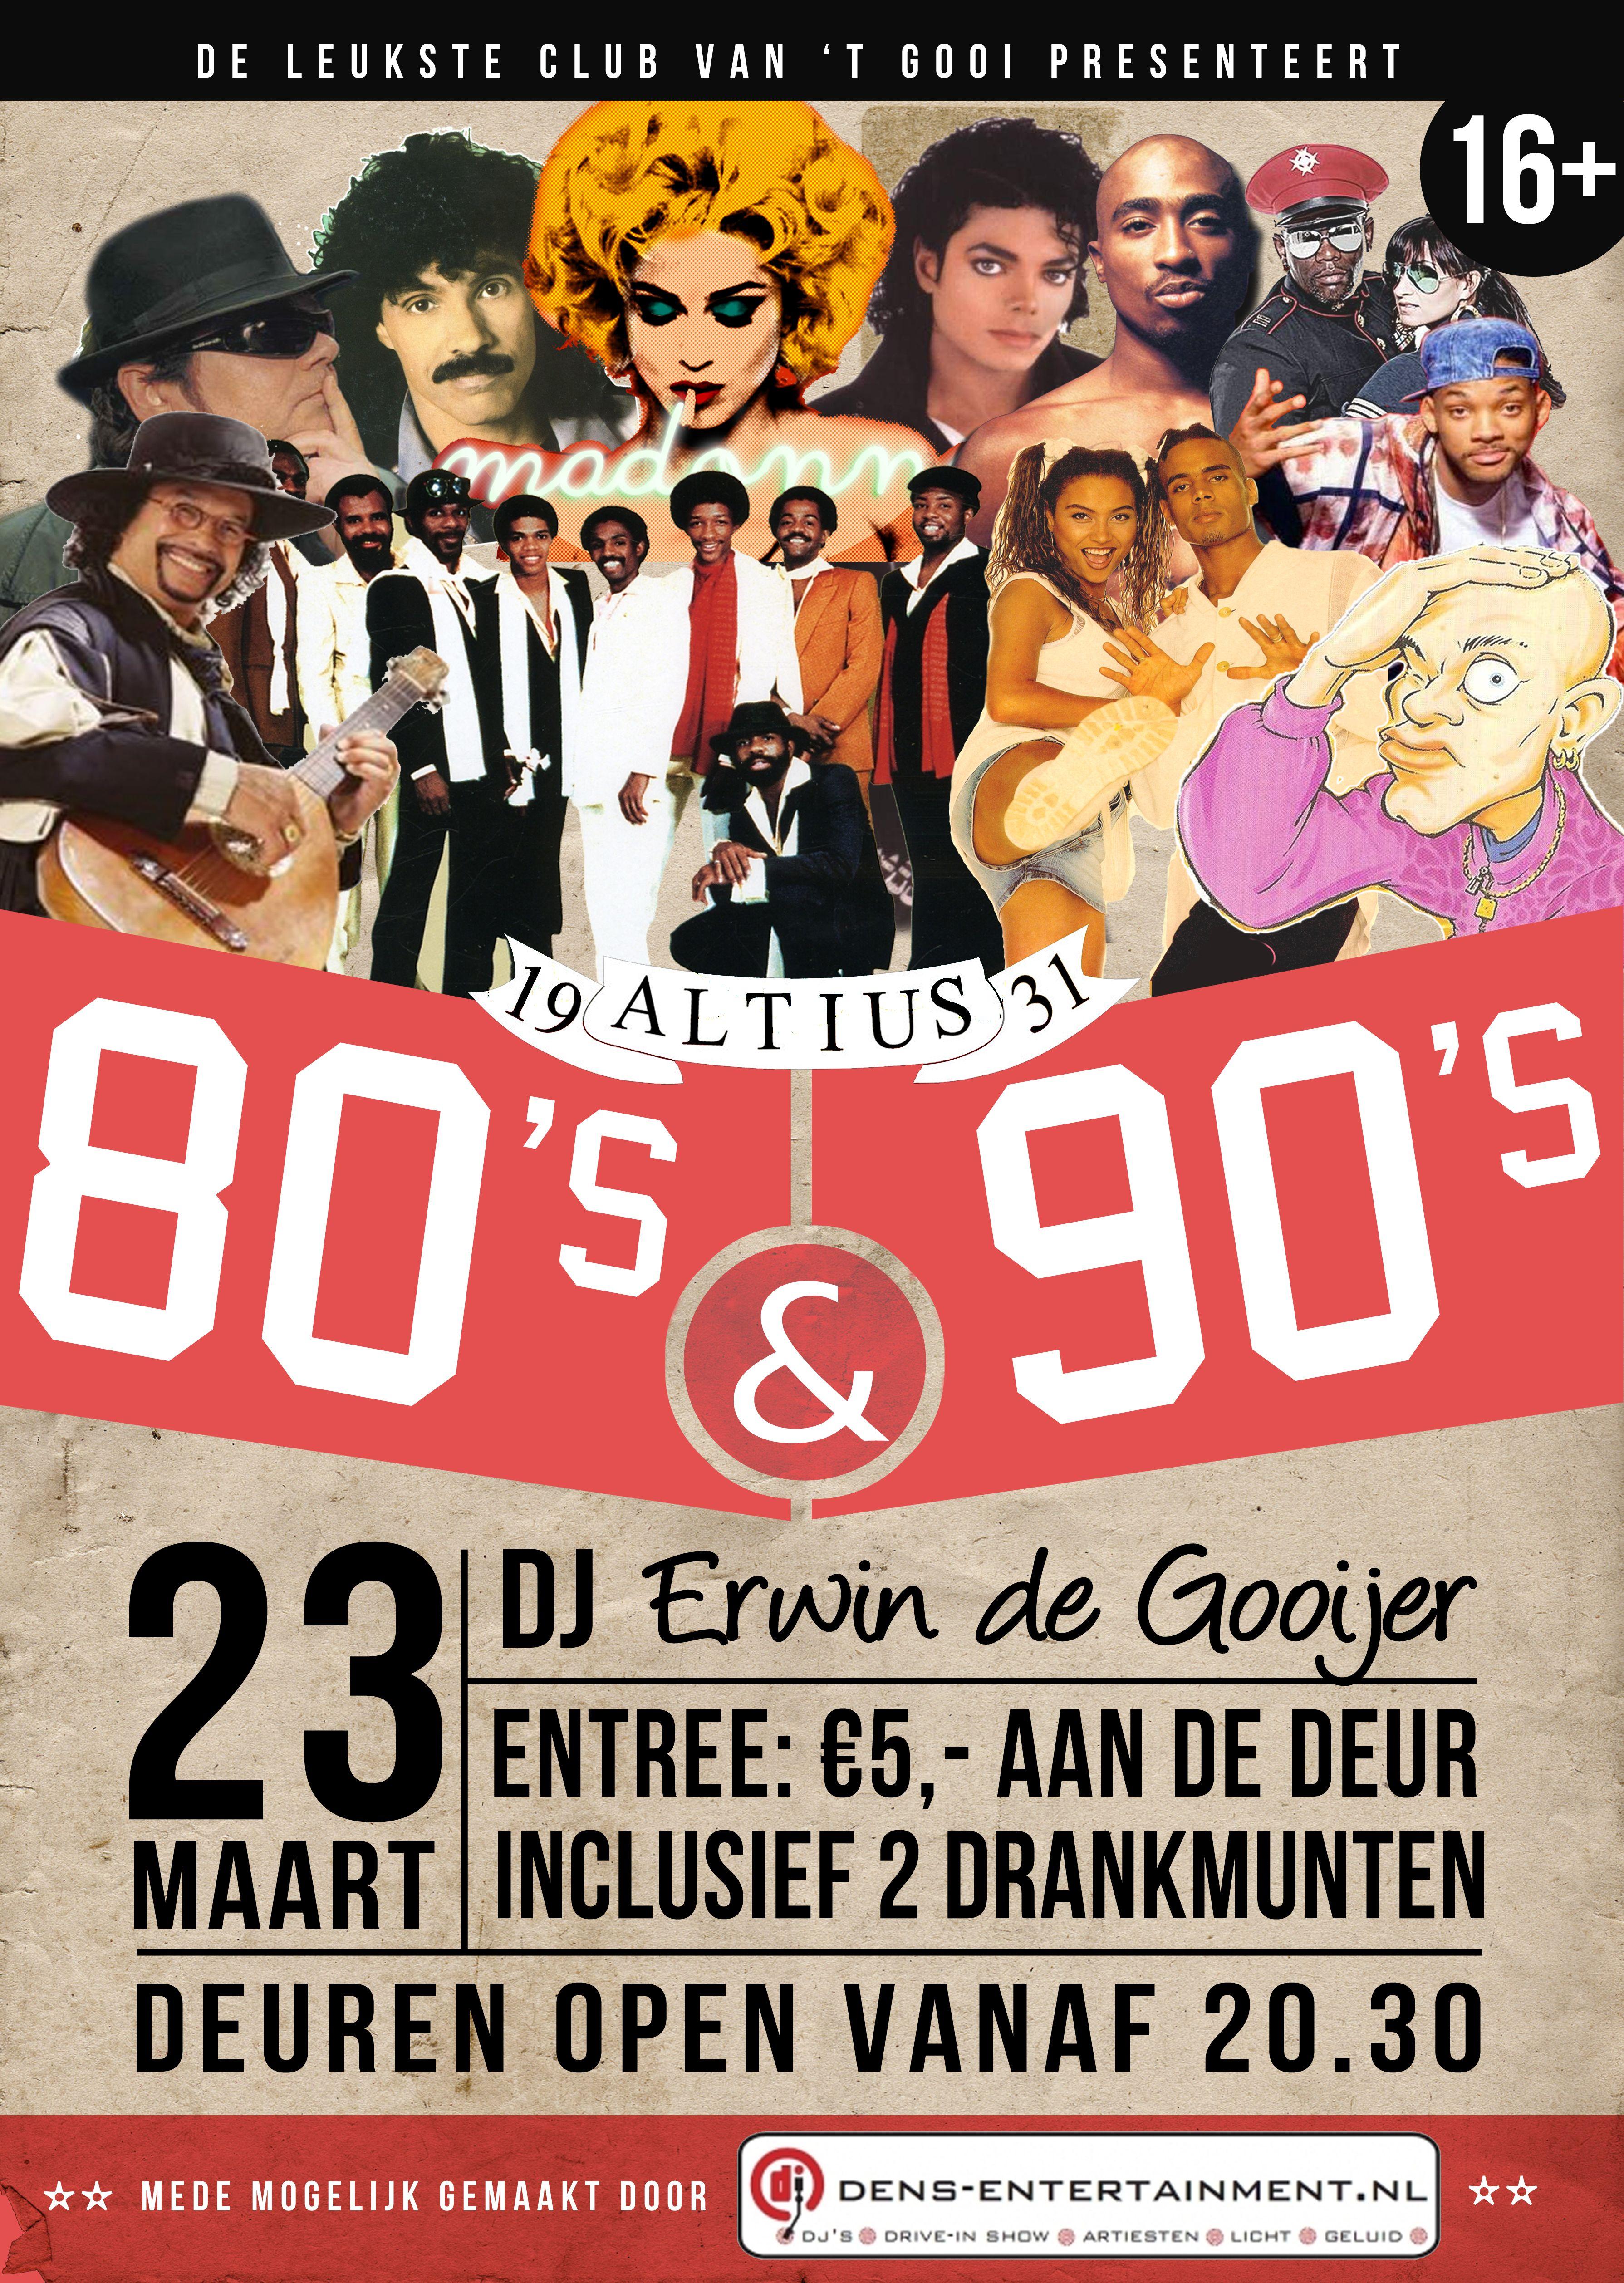 90s poster design - Poster 80 S 90 S Party V V Altius Design By Michiel Wilman